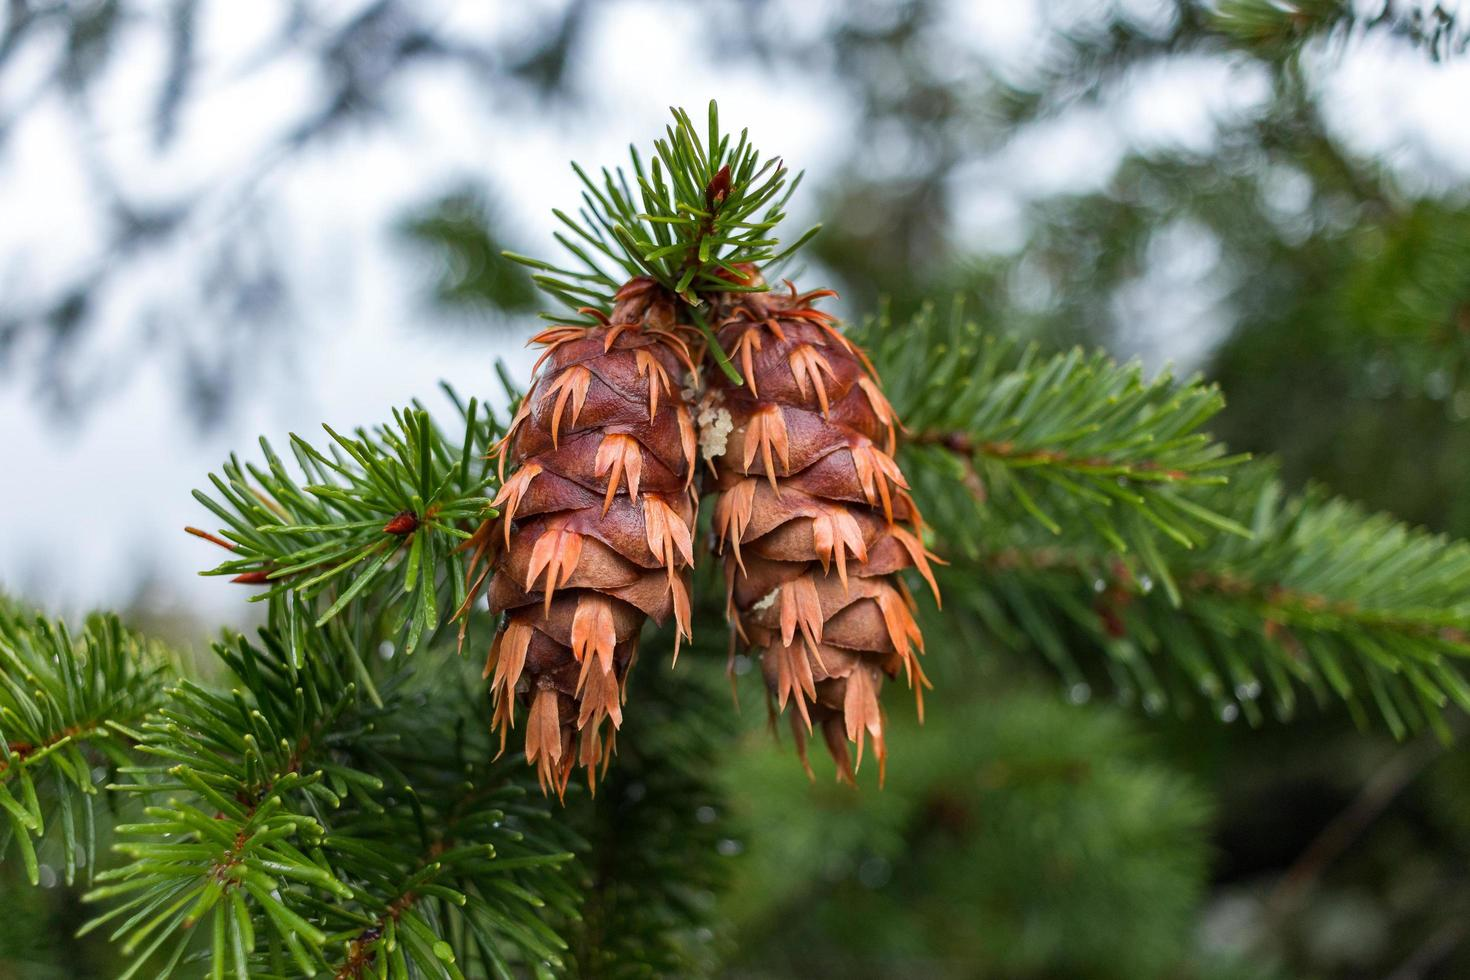 Pinecones on evergreen branch photo